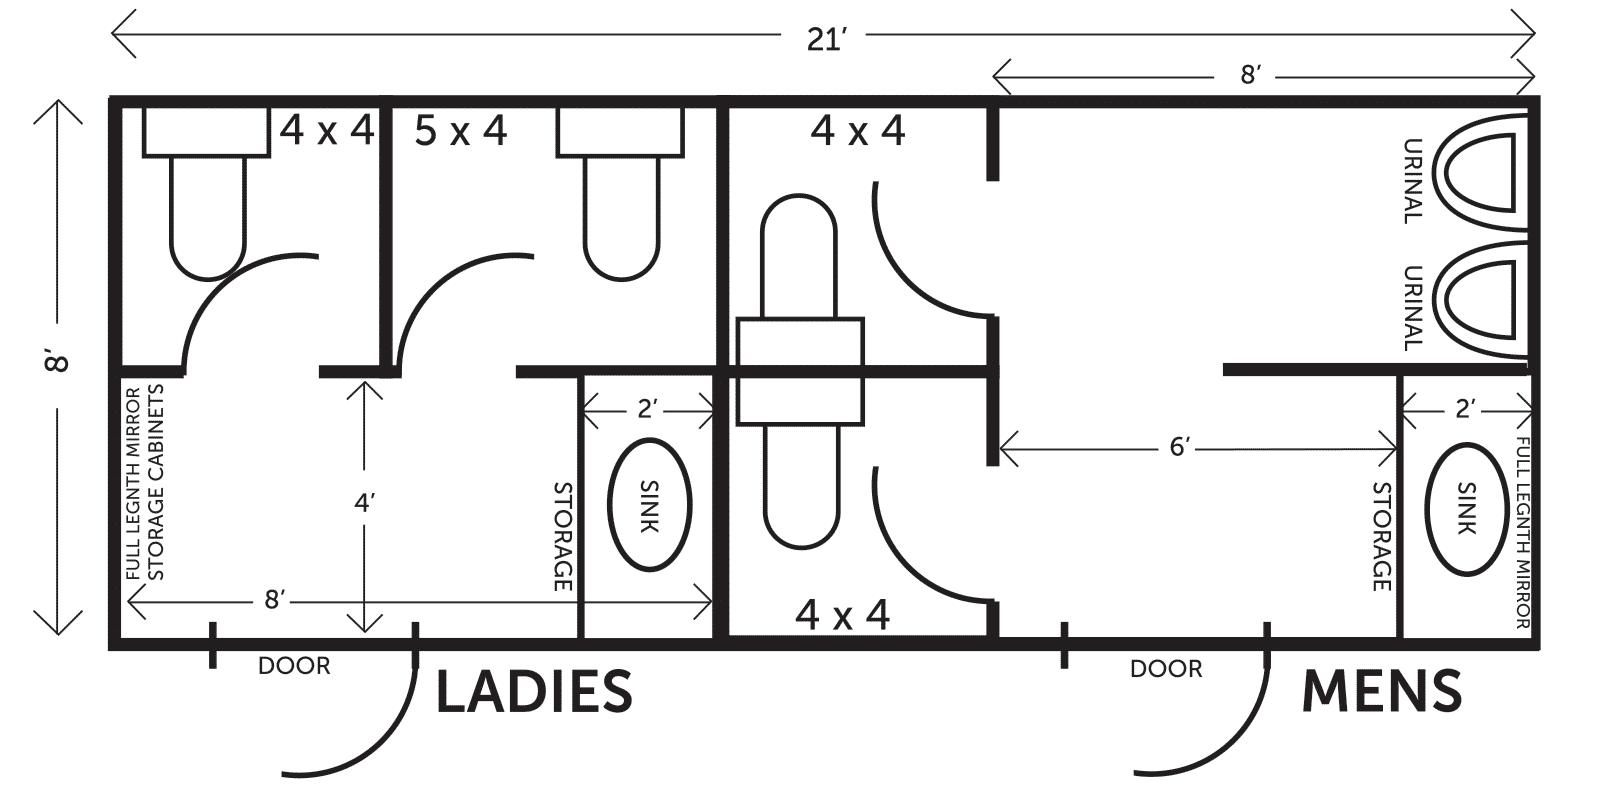 luxury-4unit-restroom-trailer